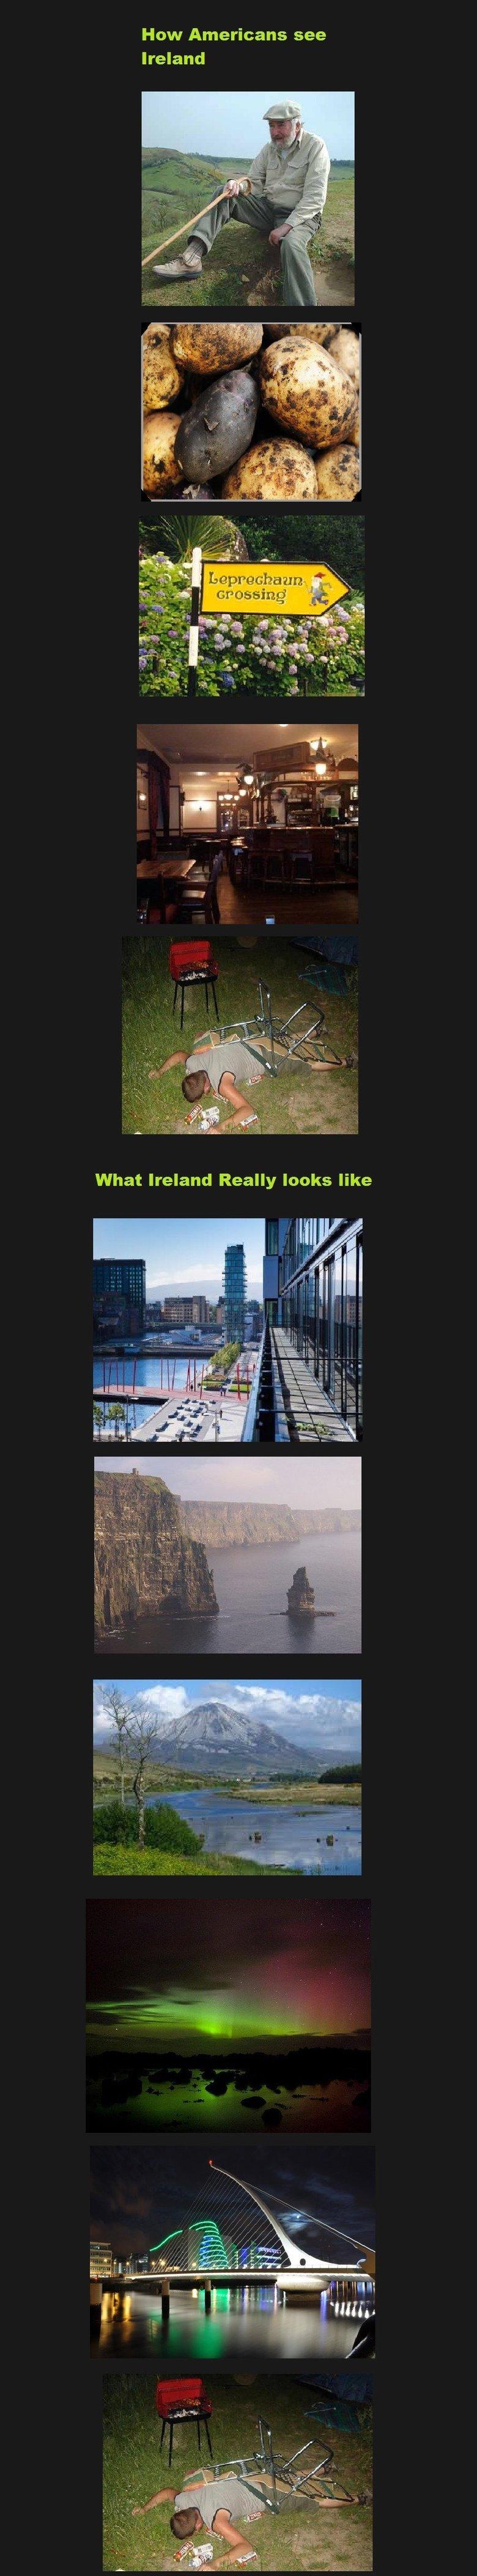 ireland. . How Americans see Ireland. How the English see Ireland.